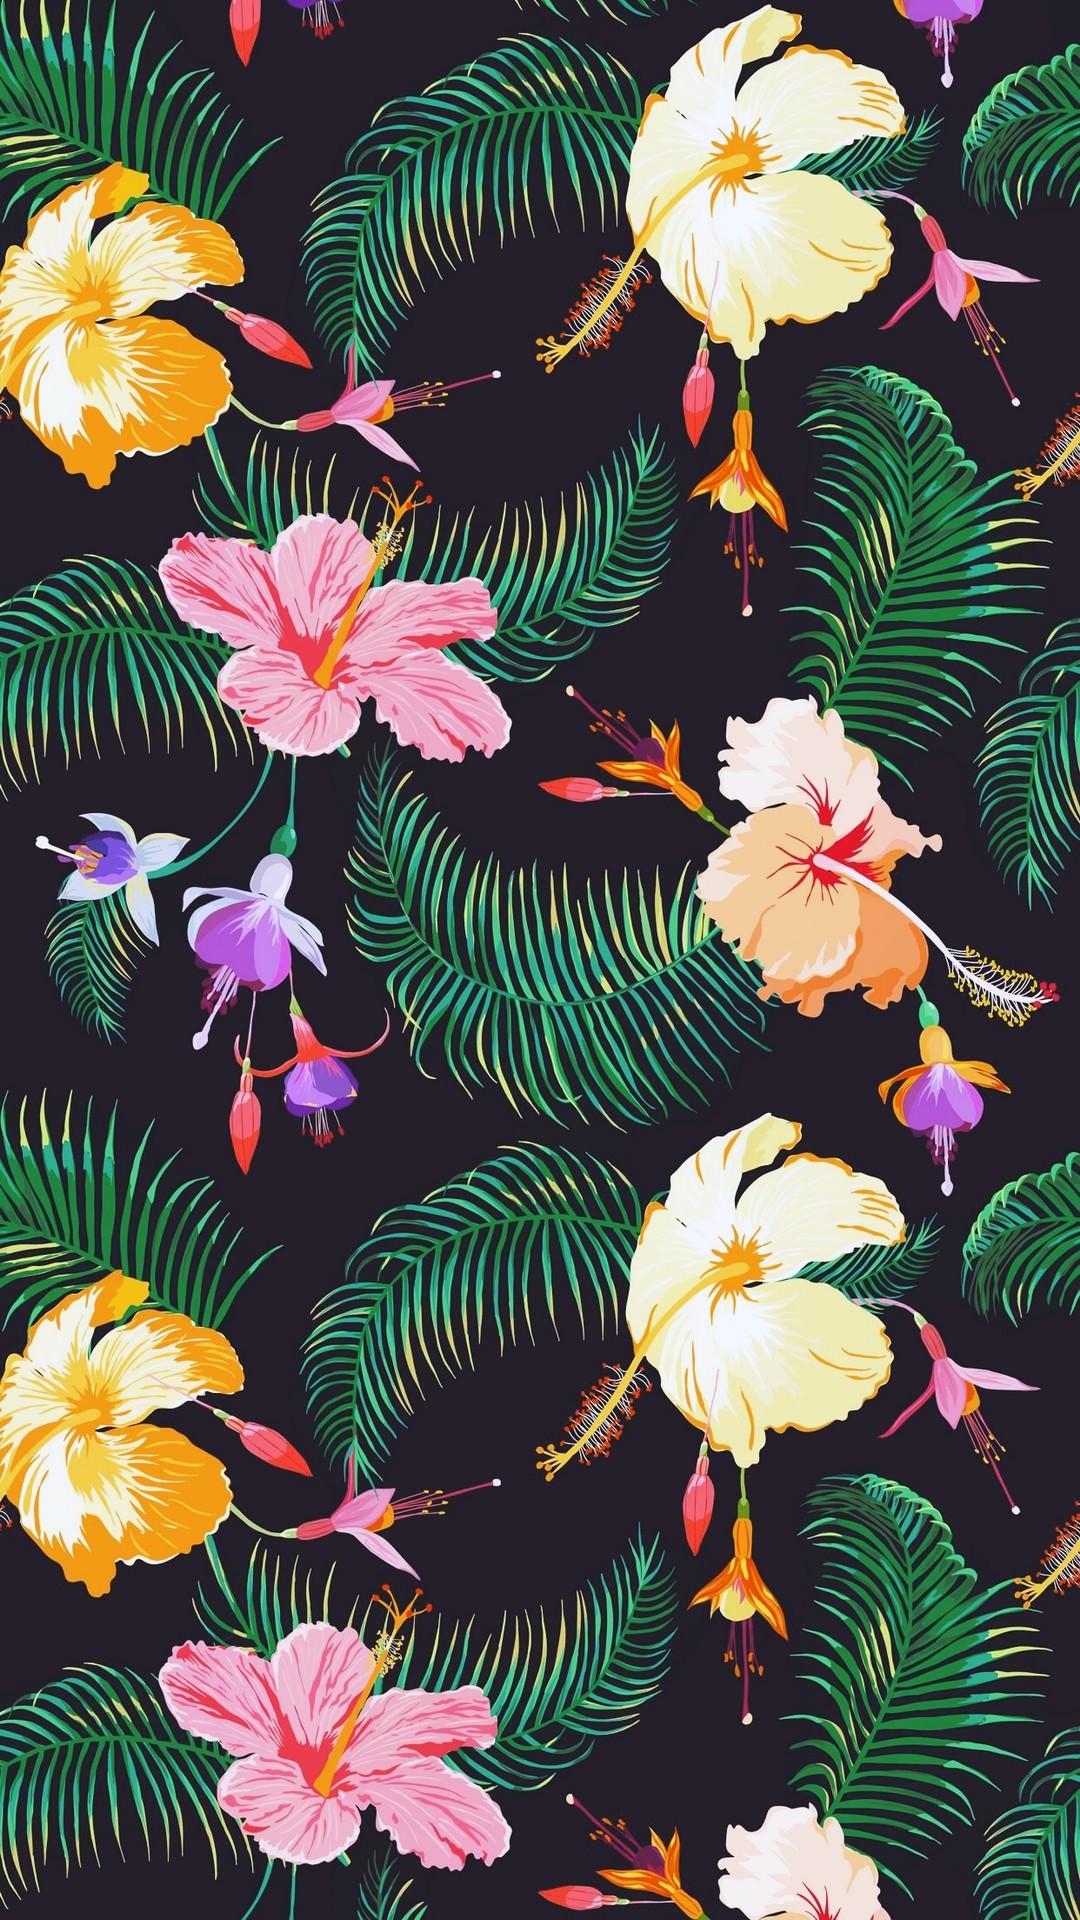 Art ios wallpaper